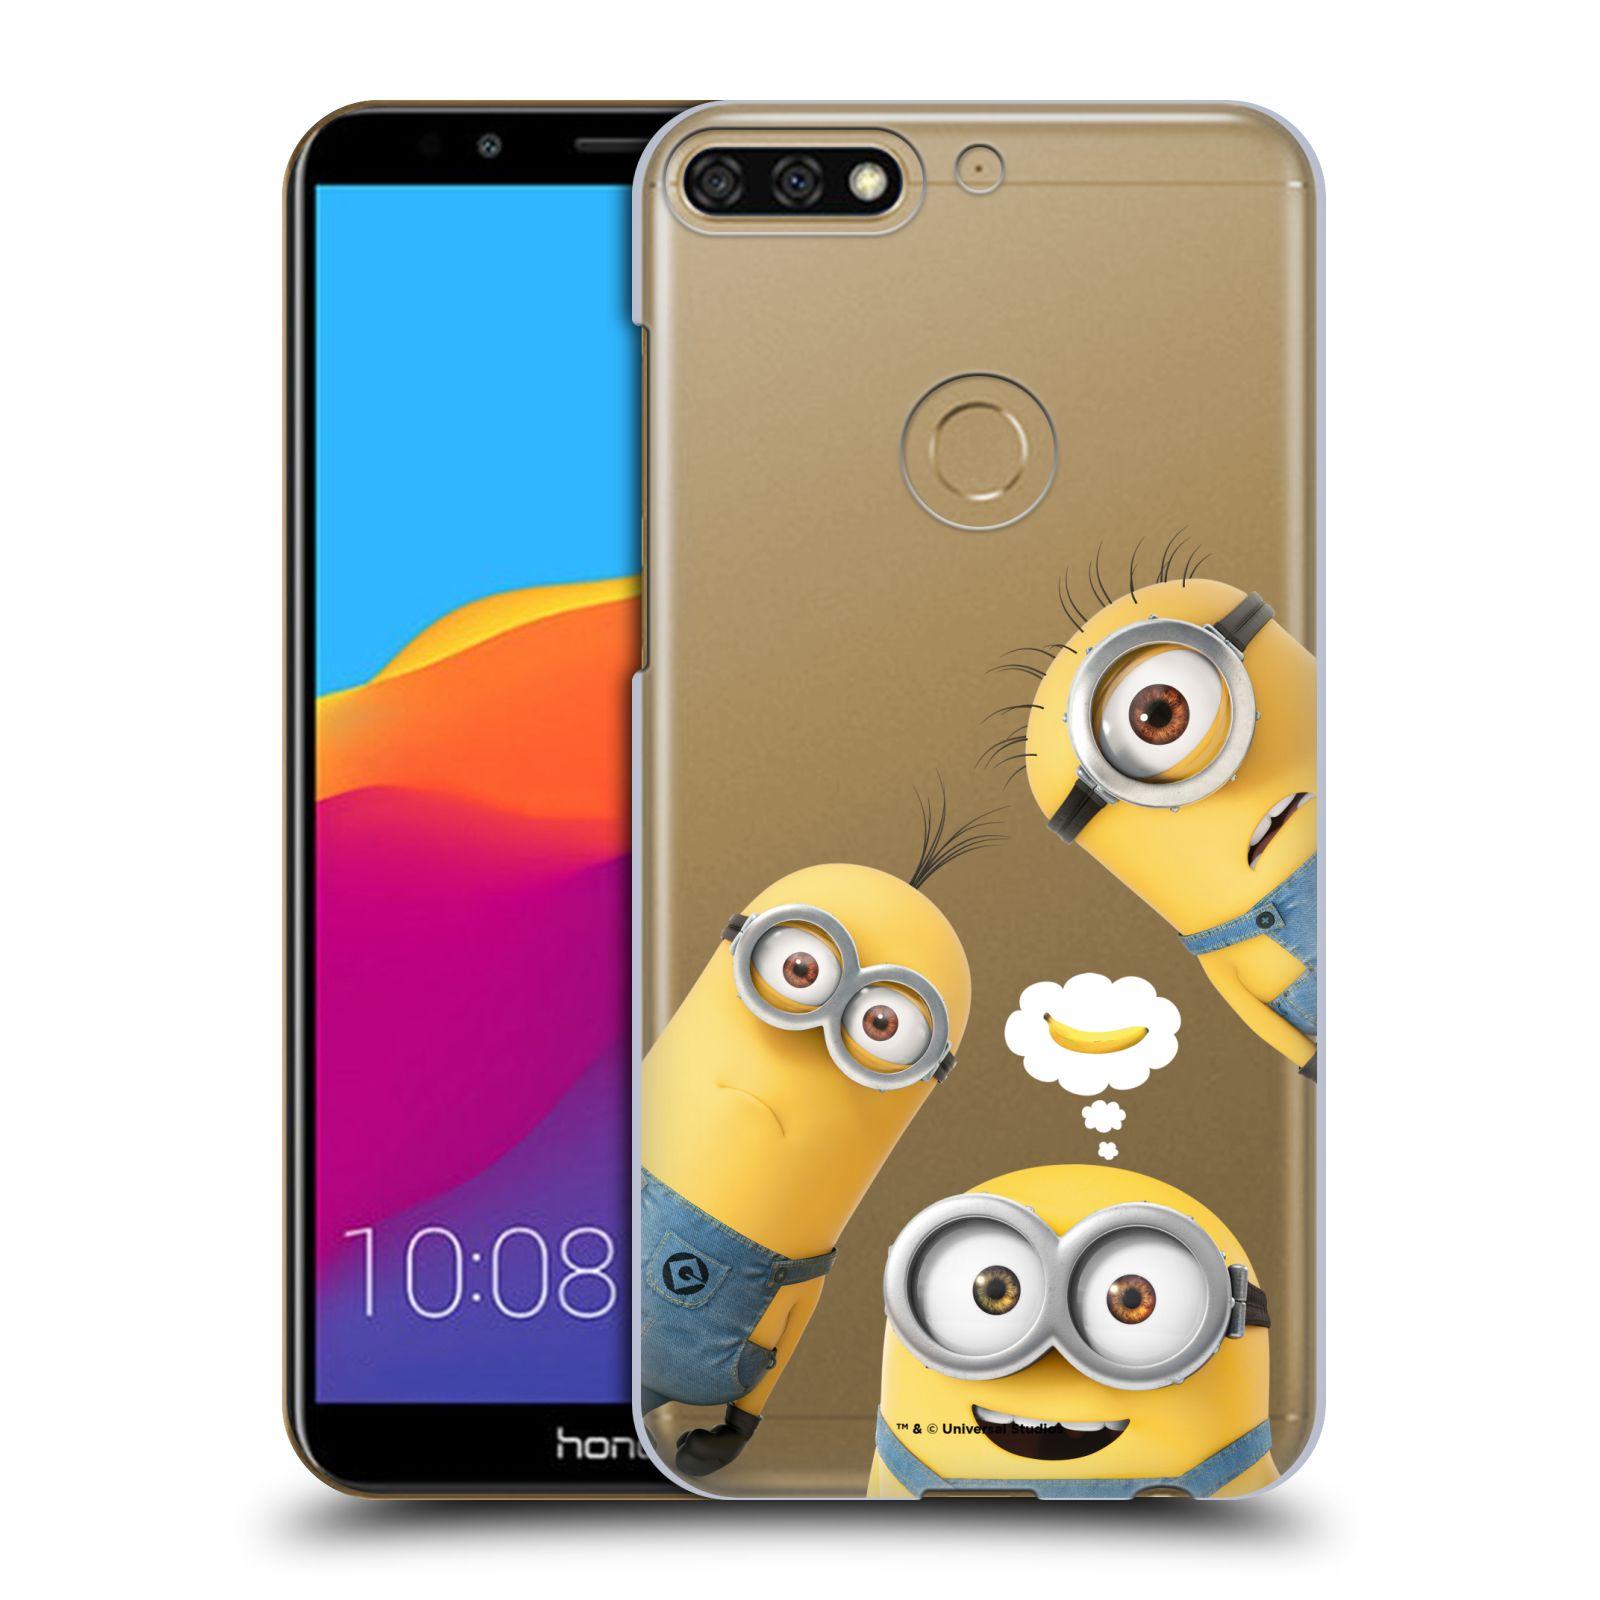 Plastové pouzdro na mobil Huawei Y7 Prime 2018 - Head Case - Mimoni Banana z filmu Já, padouch - Despicable Me